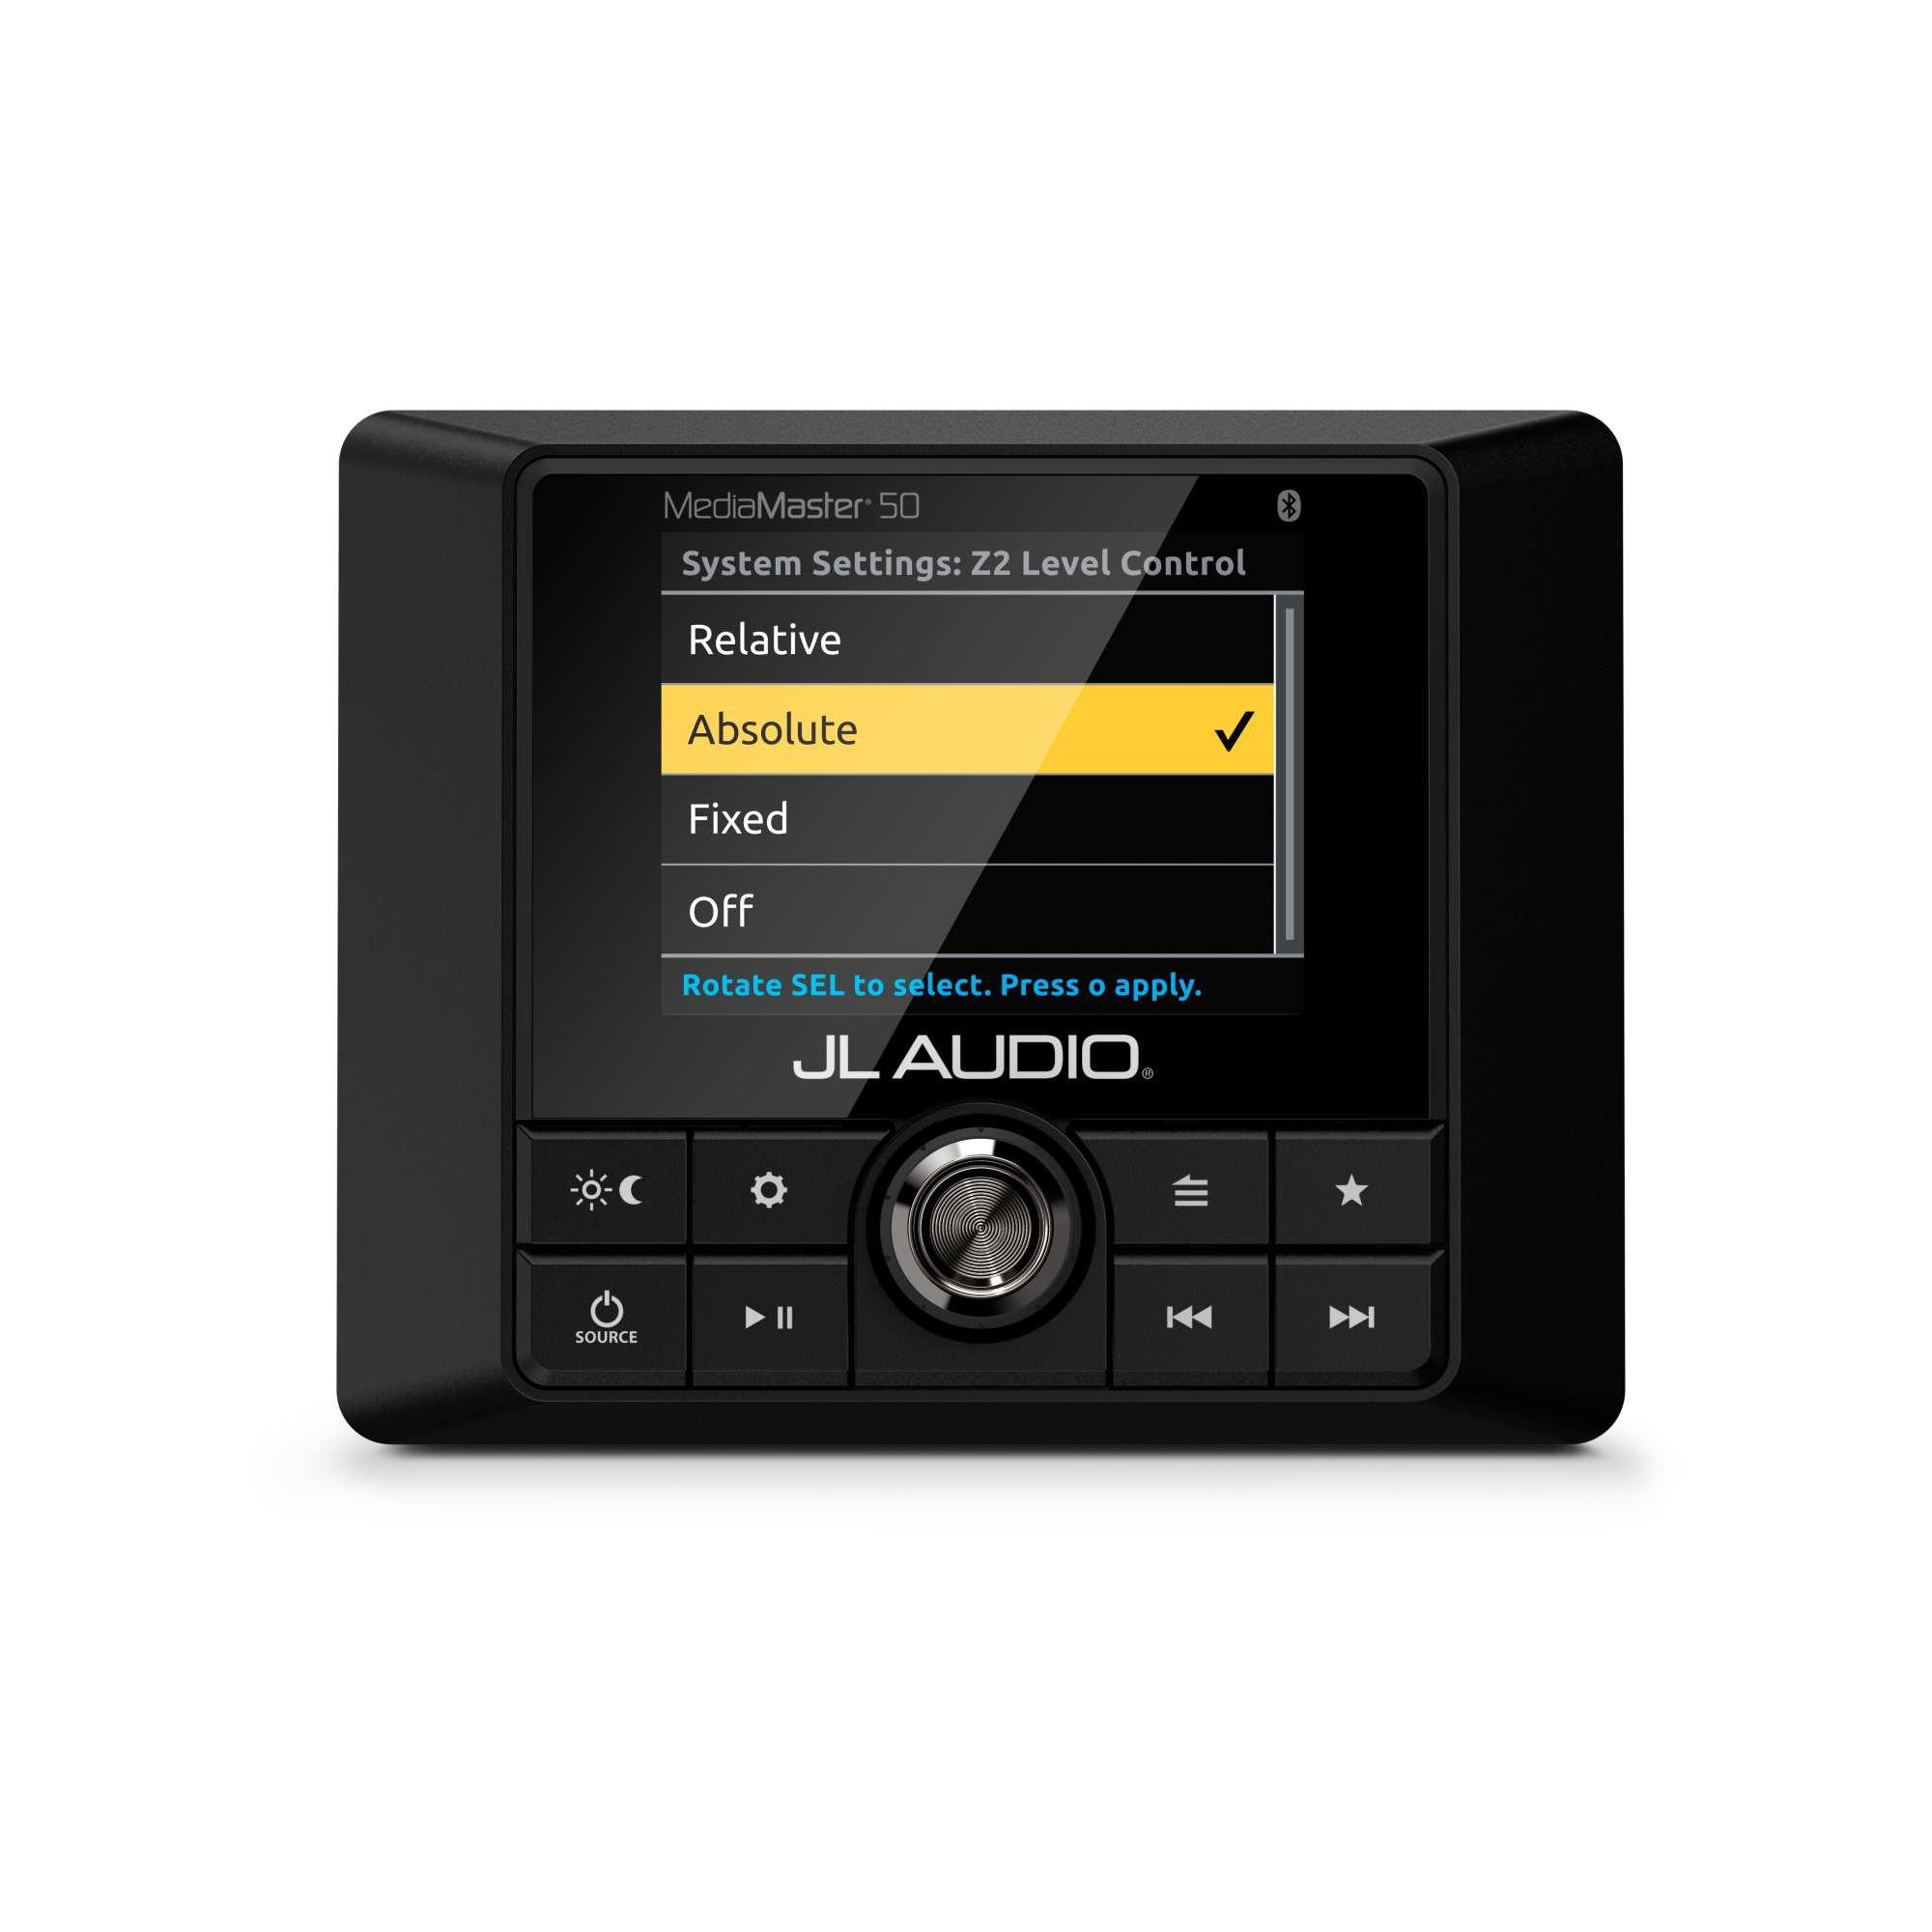 Jx500 1d Jl Audio Wiring Diagram Electrical Diagrams 2 W3 Master Media Wire Data Schema U2022 Subwoofer